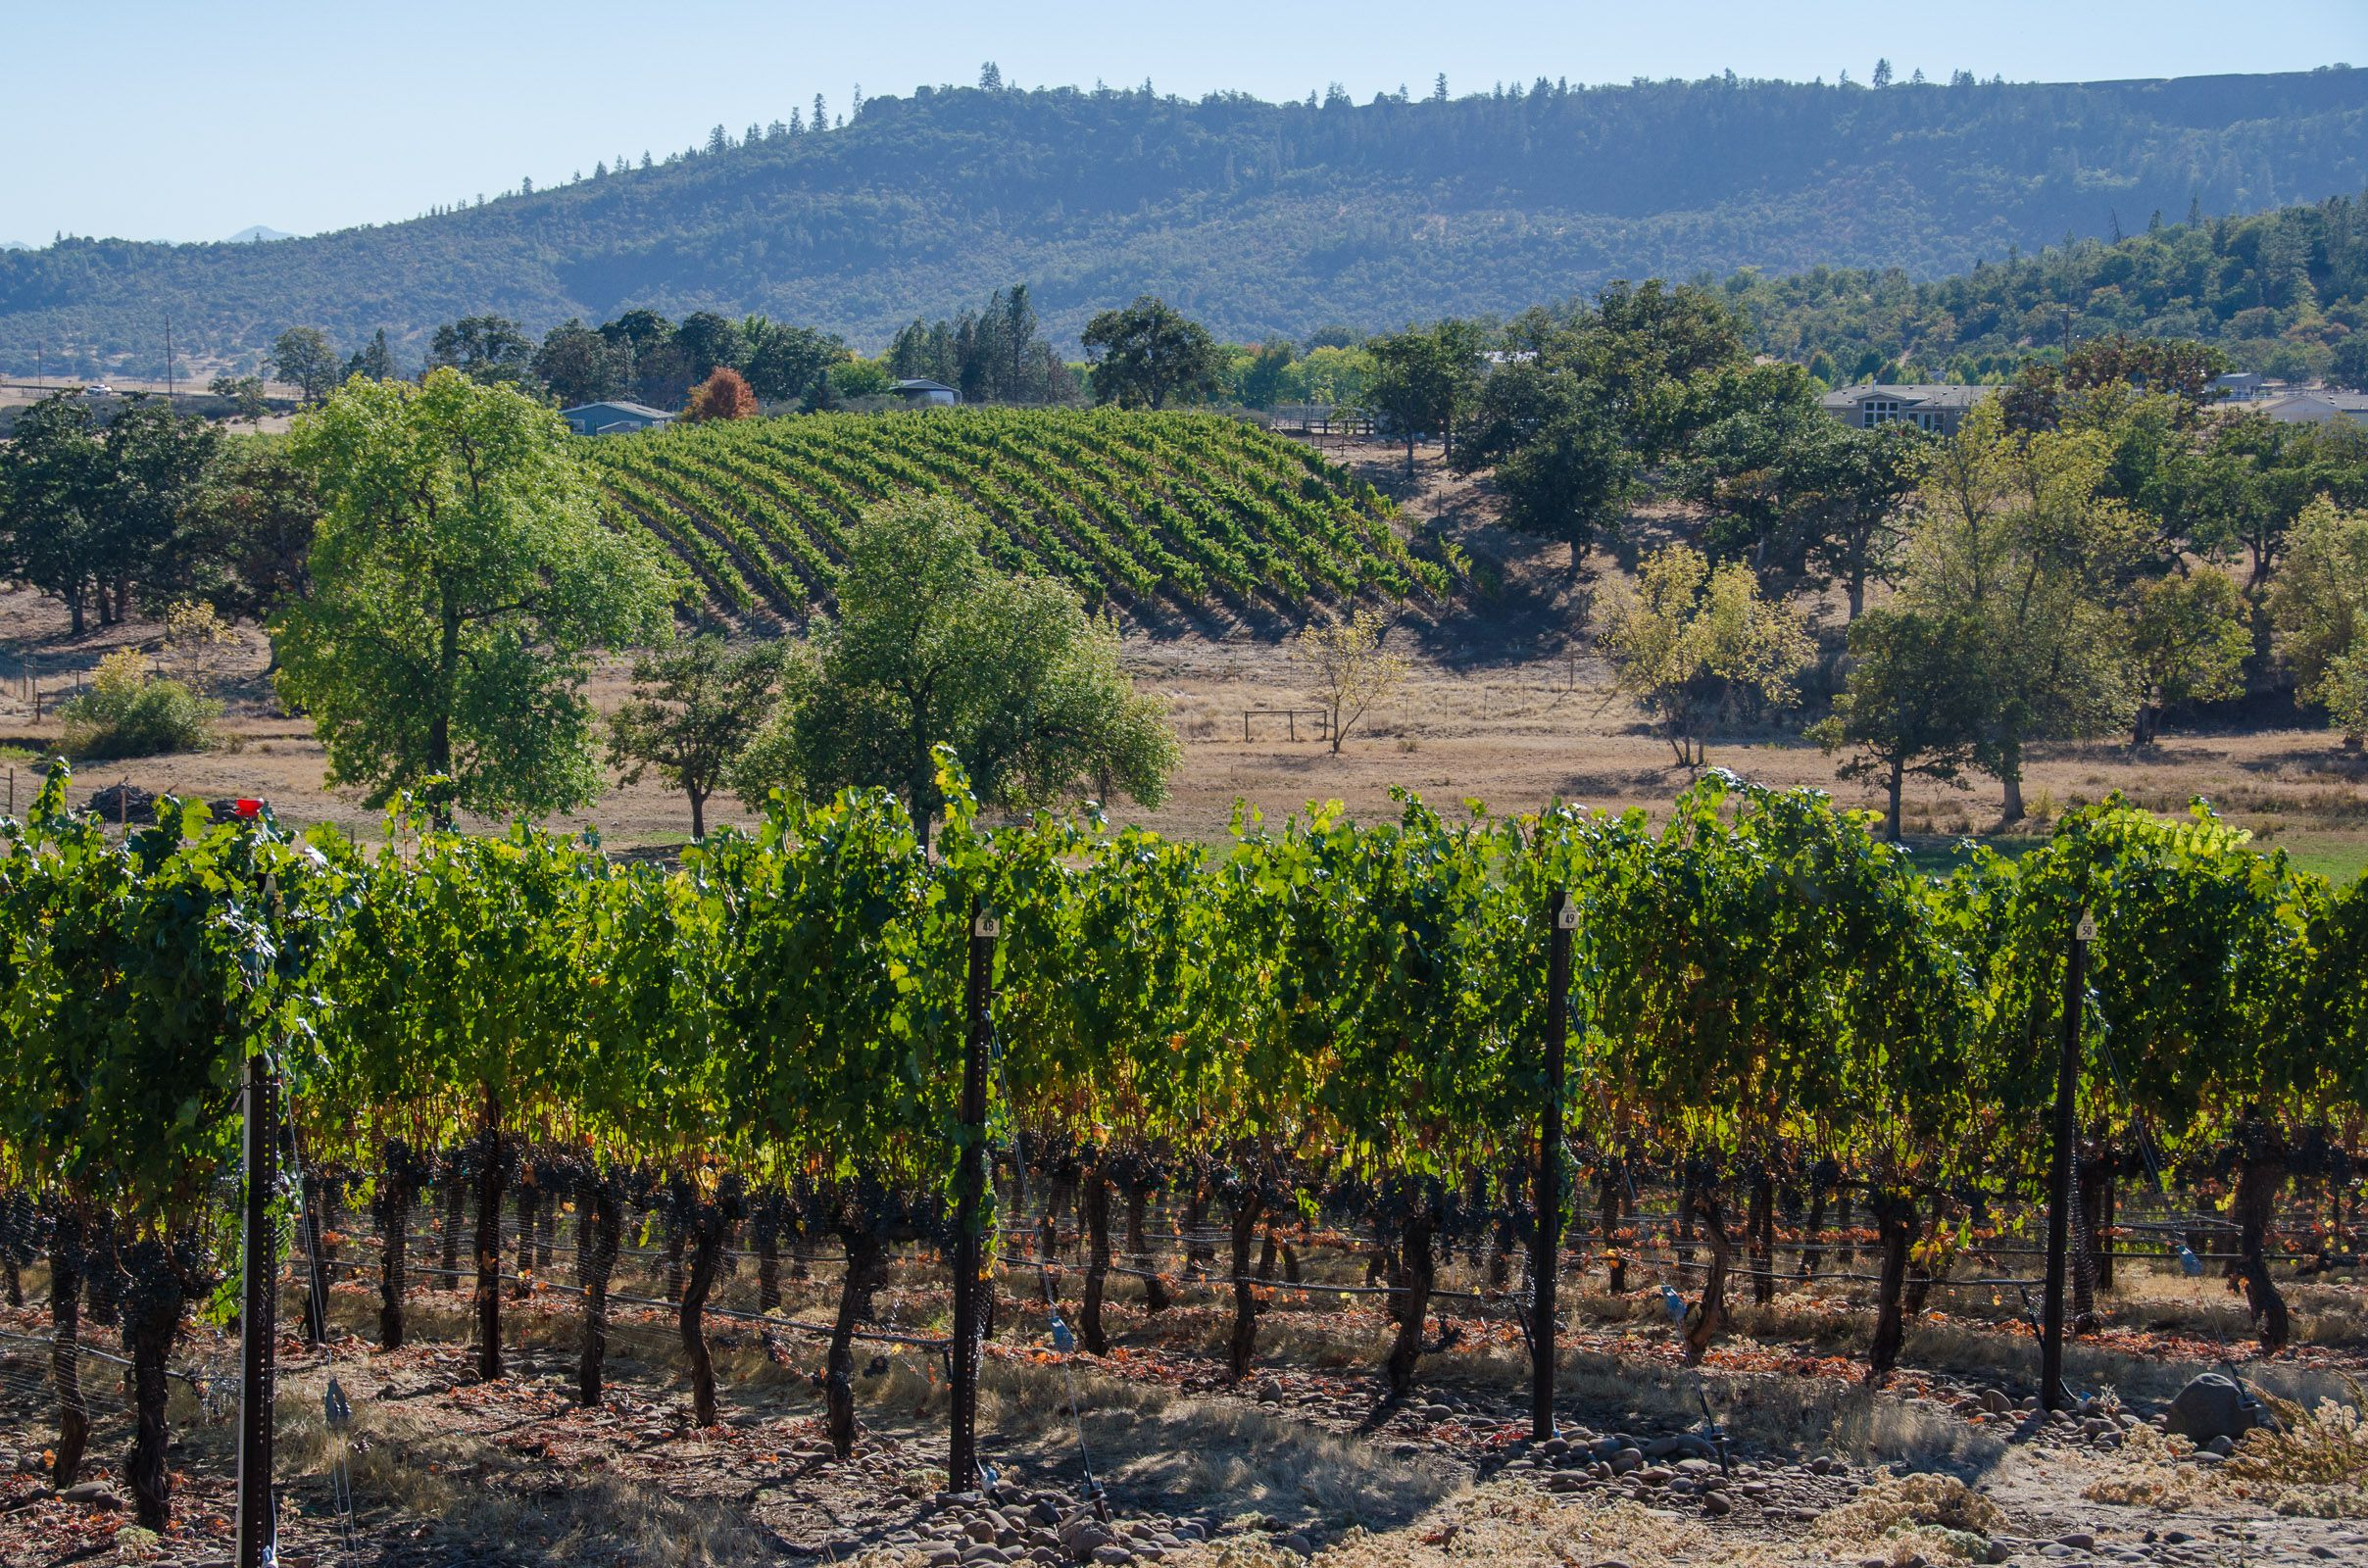 Vineyards on Table Rock, Oregon